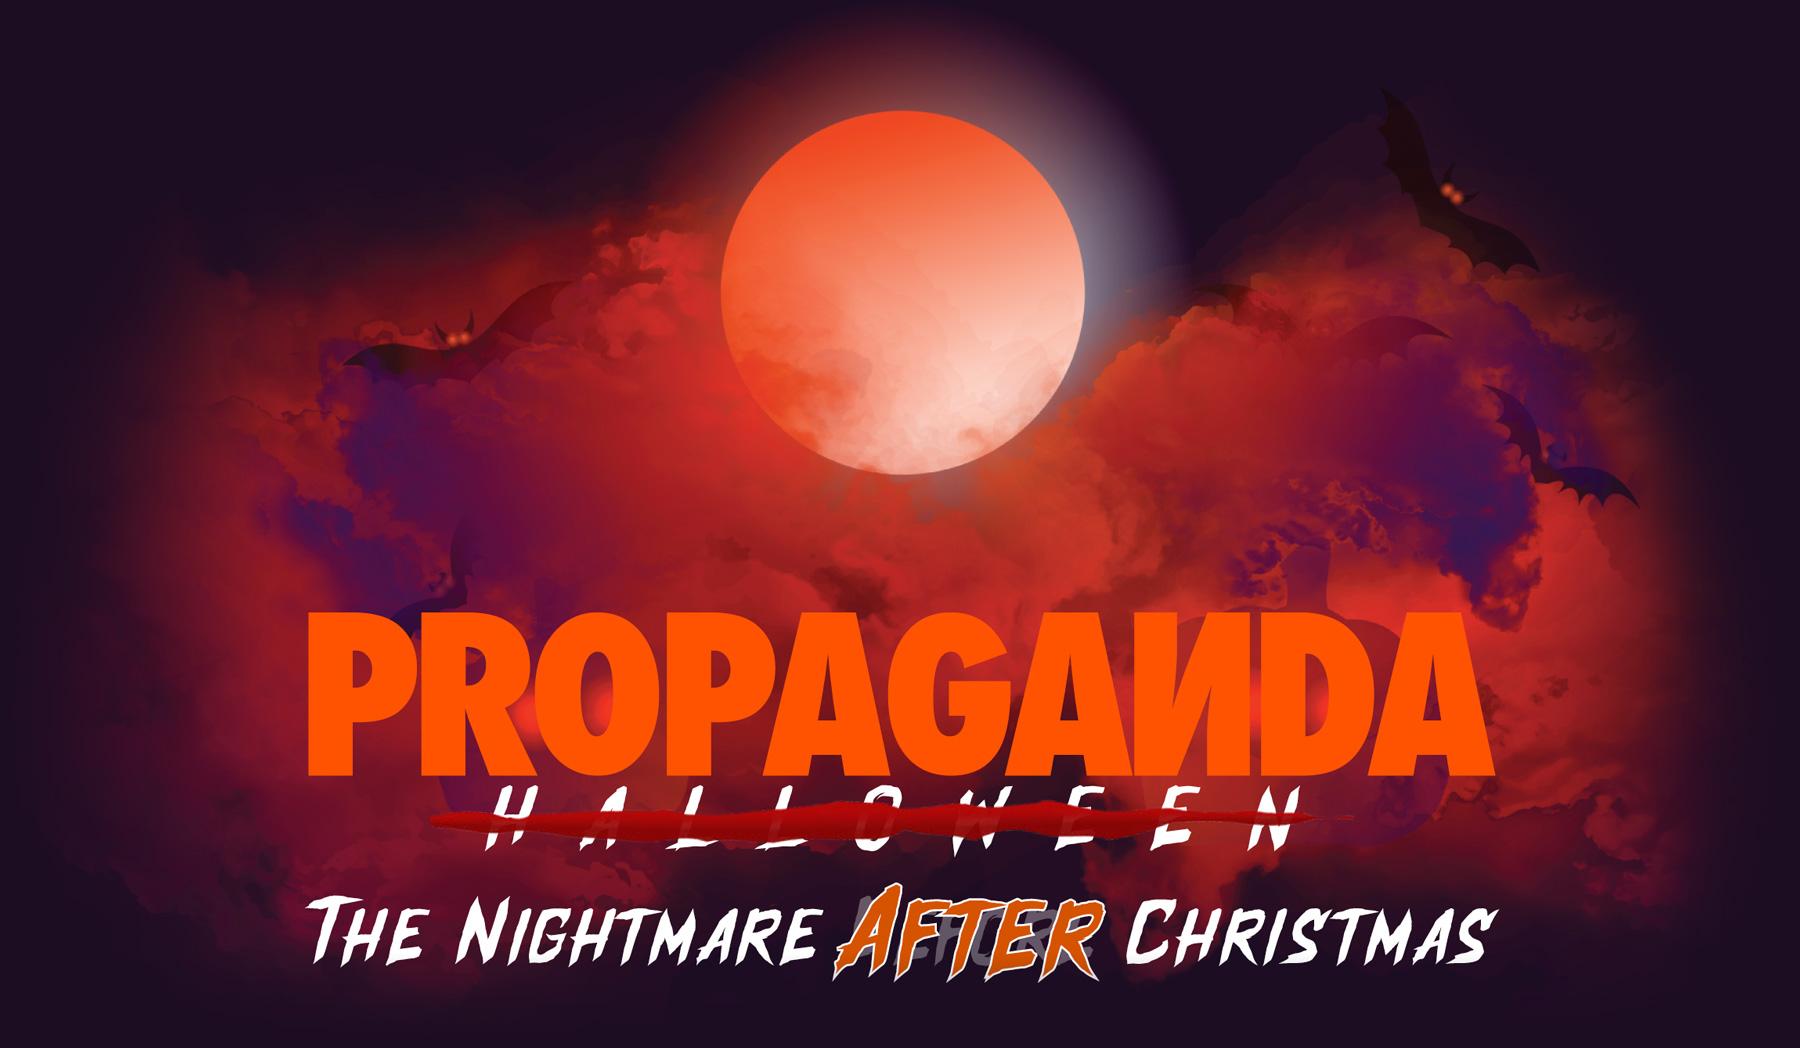 PROPAGANDA: The Nightmare After Christmas